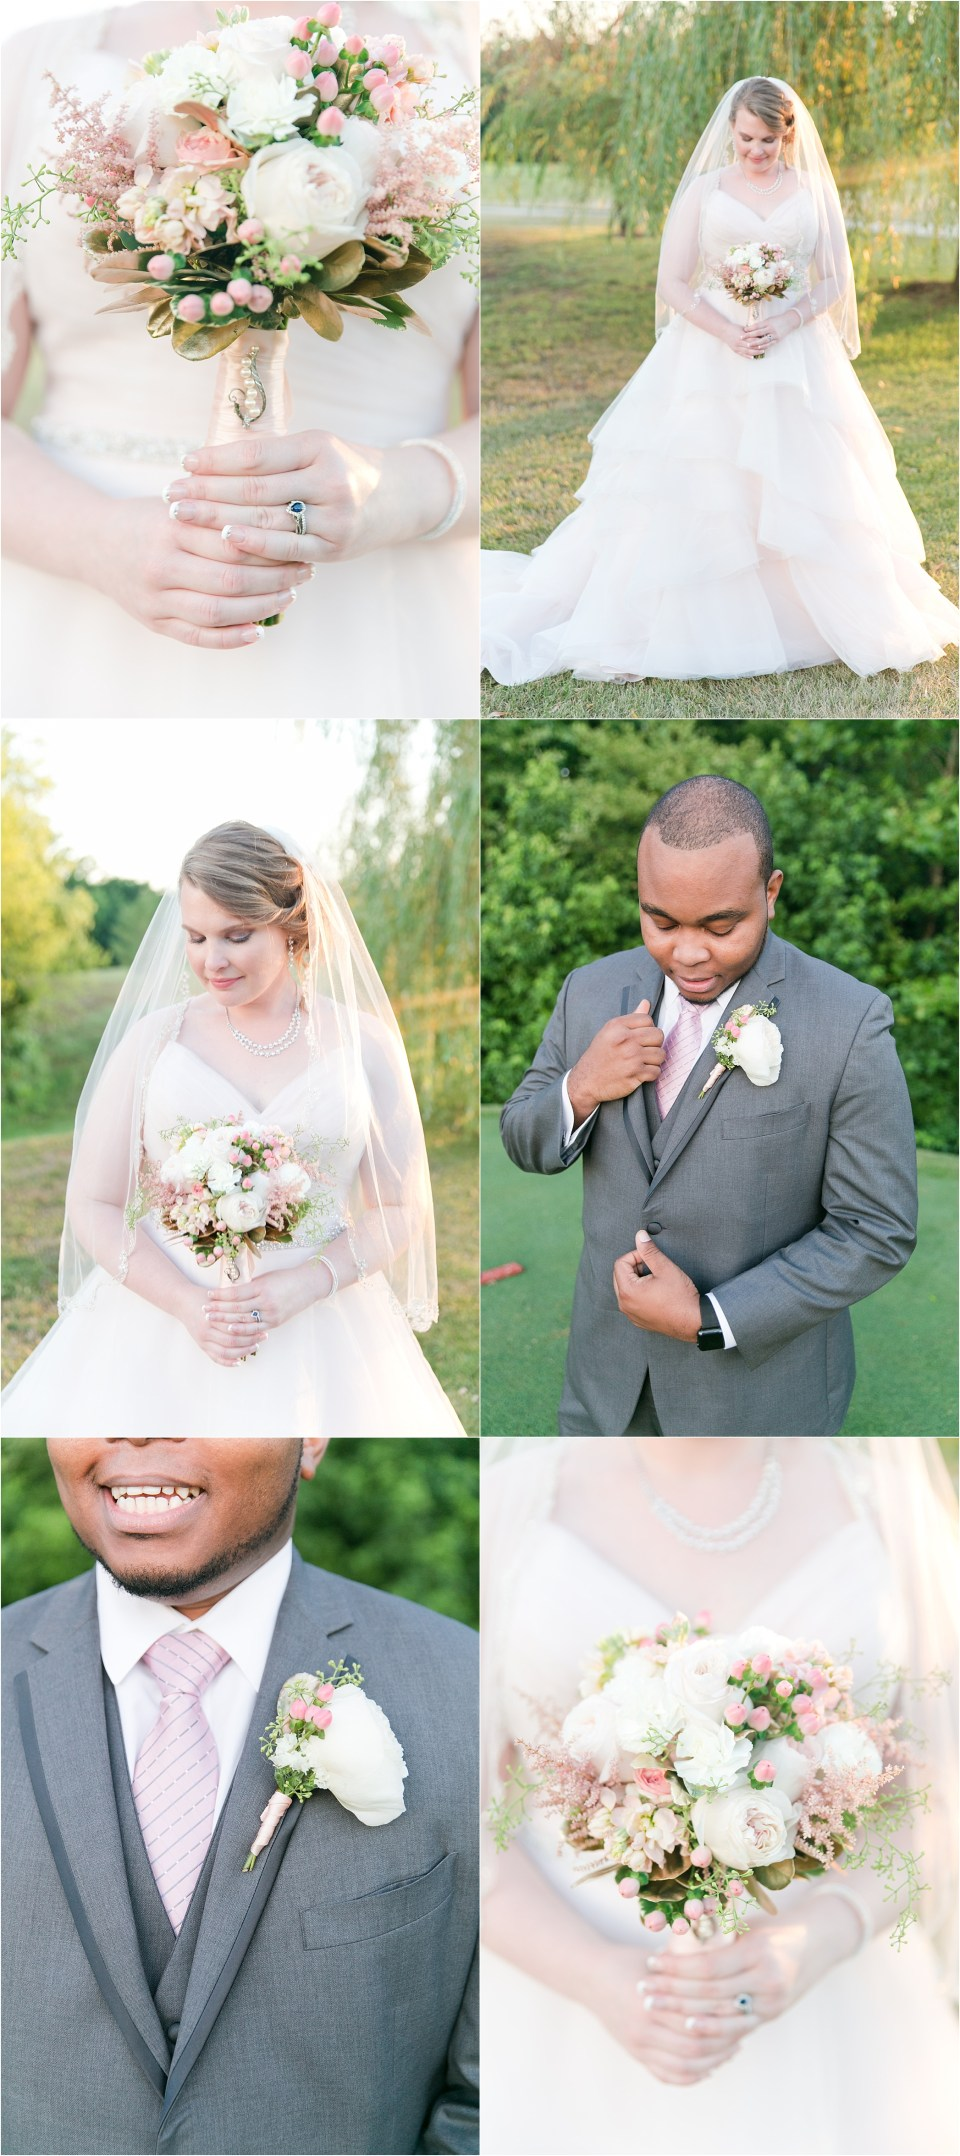 costola photography,Renditions Wedding Photographer, Annapolis, Maryland